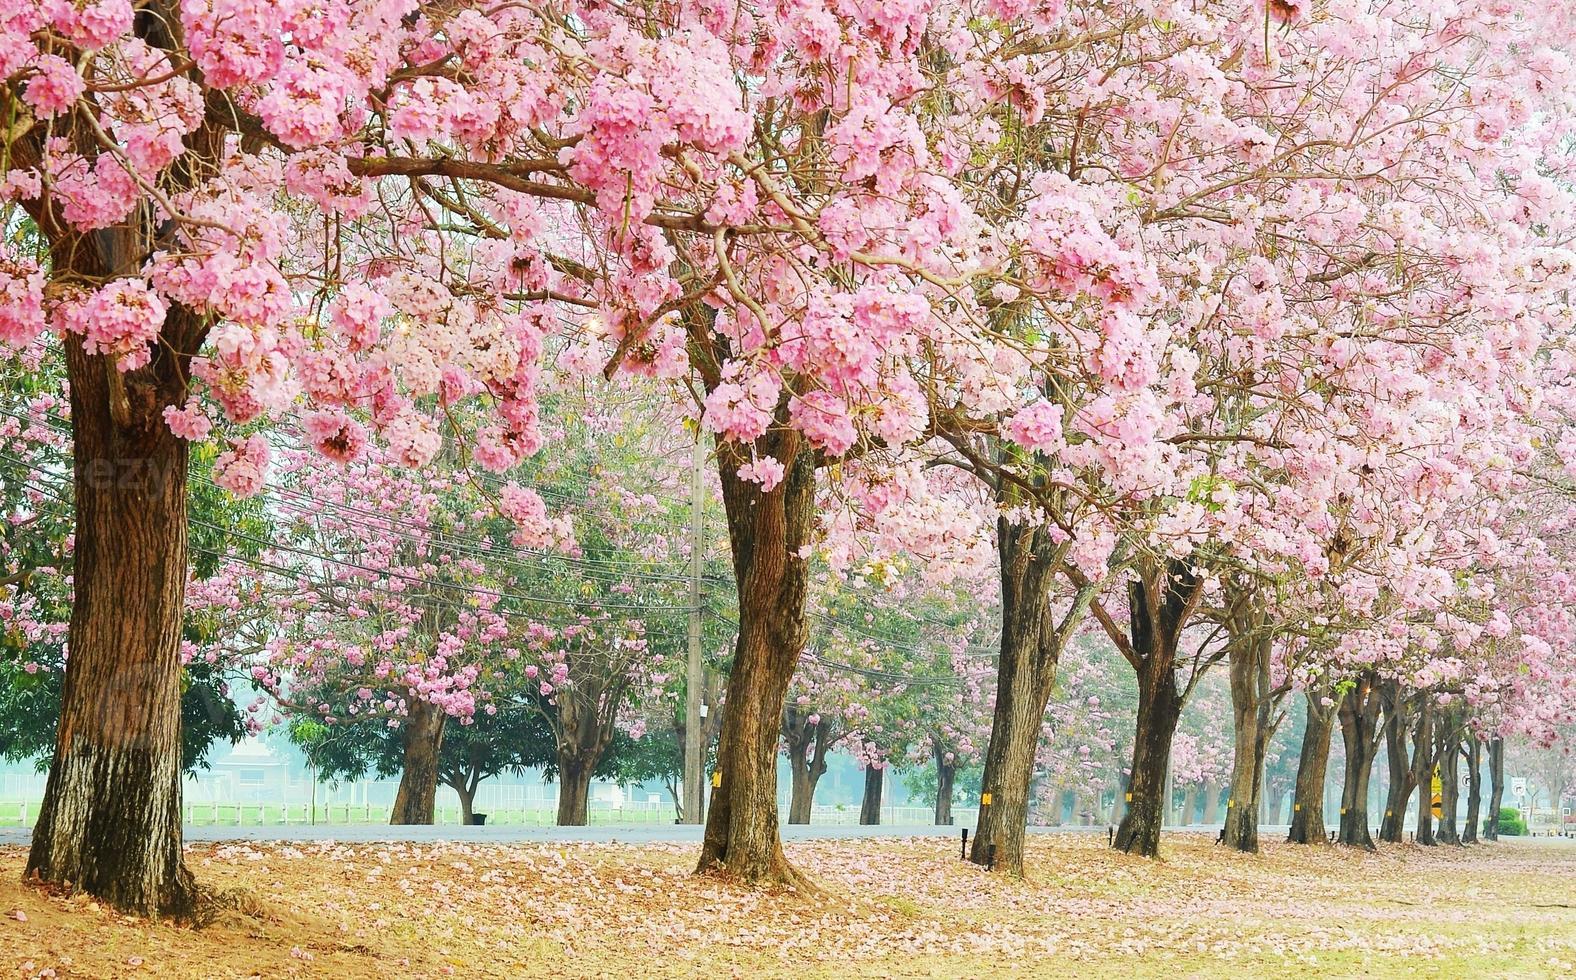 rosa trumpetträd foto